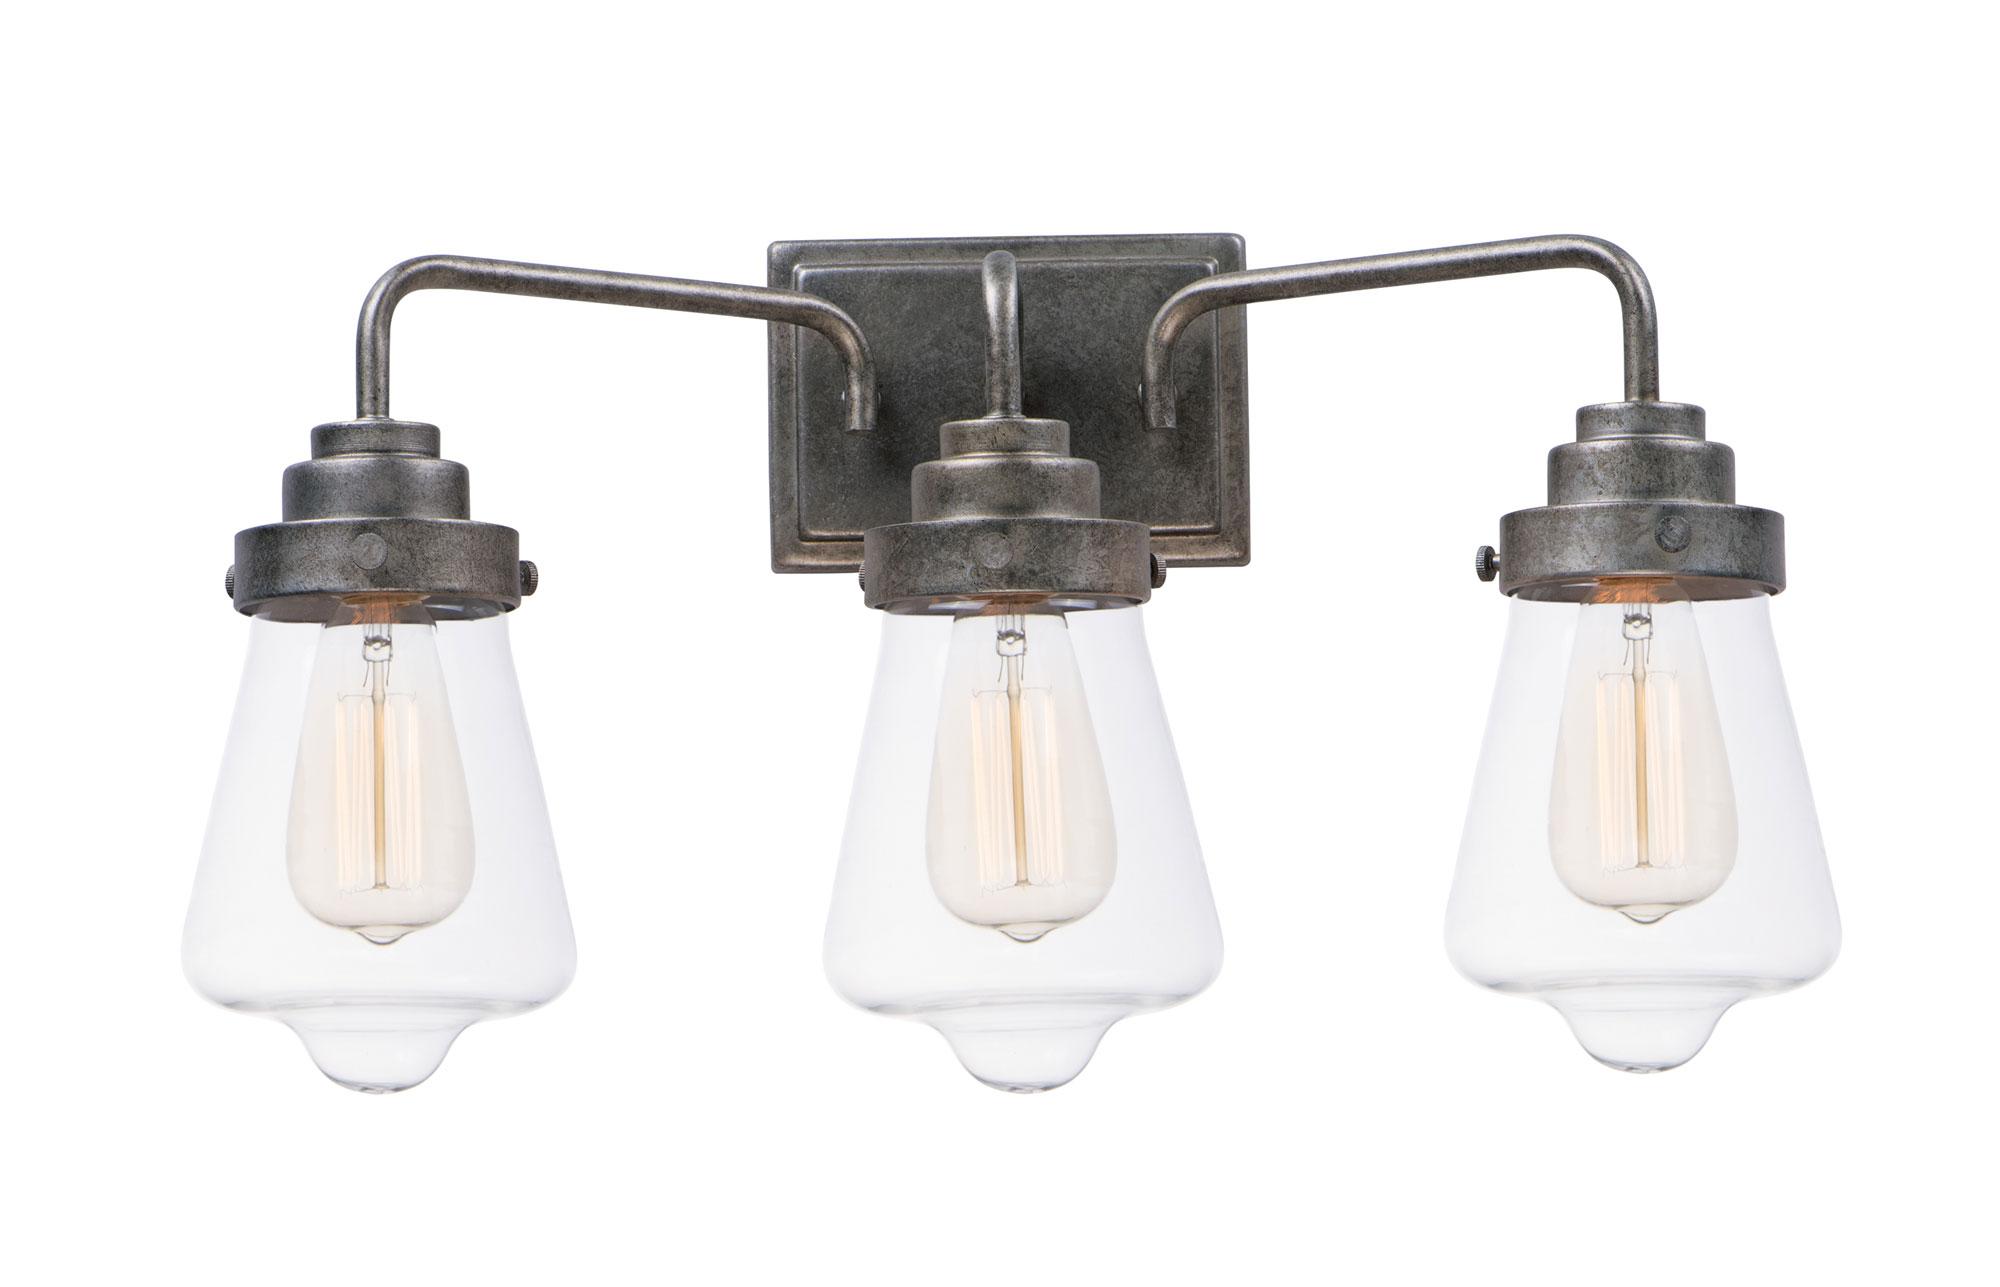 Cape cod bathroom vanity light by maxim lighting